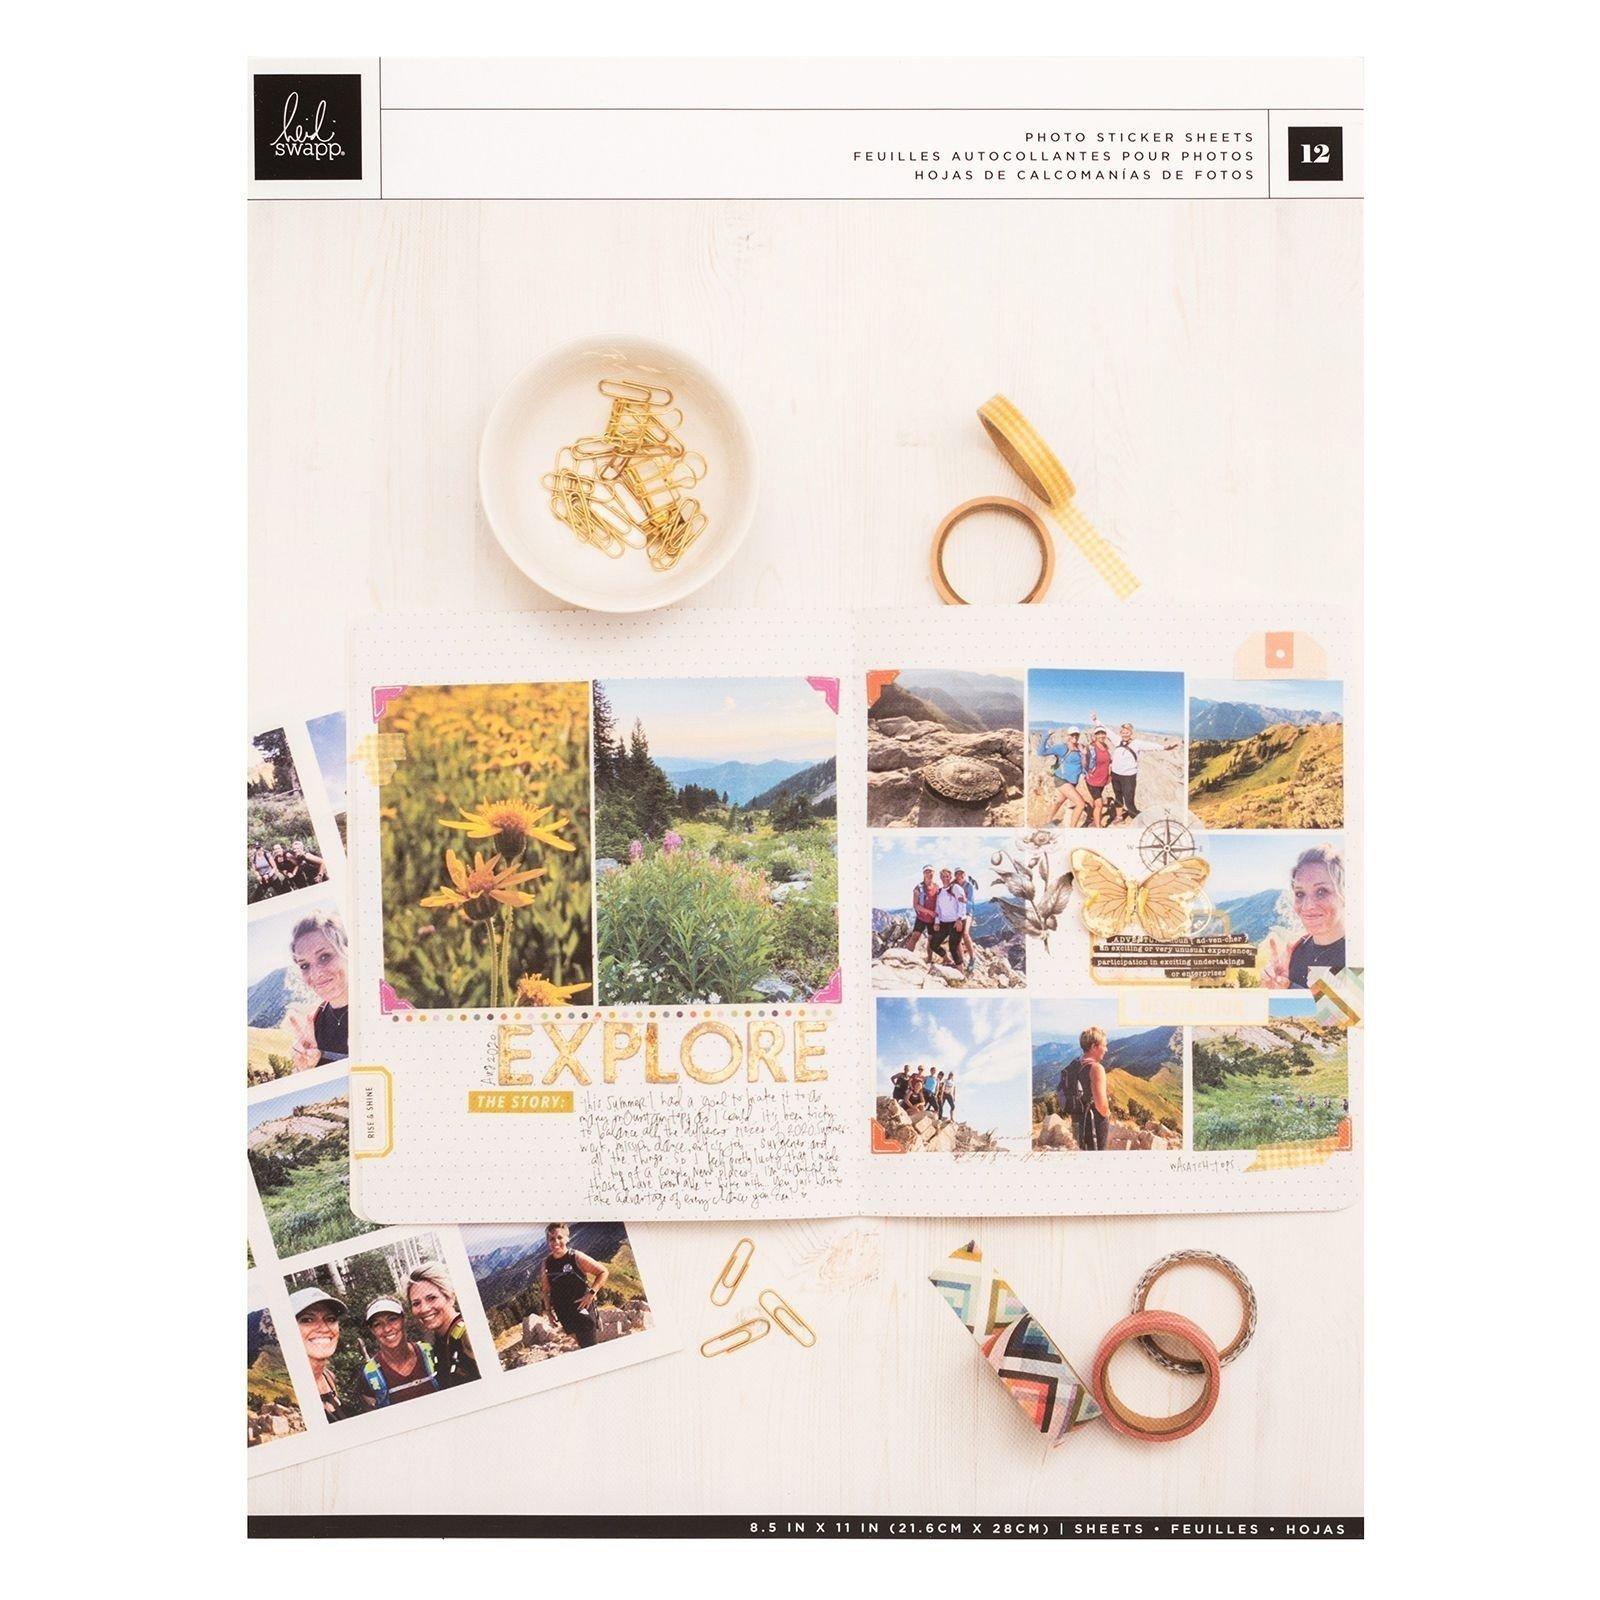 Feuilles autocollantes pour photos - Storyline Chapters - Heidi Swapp